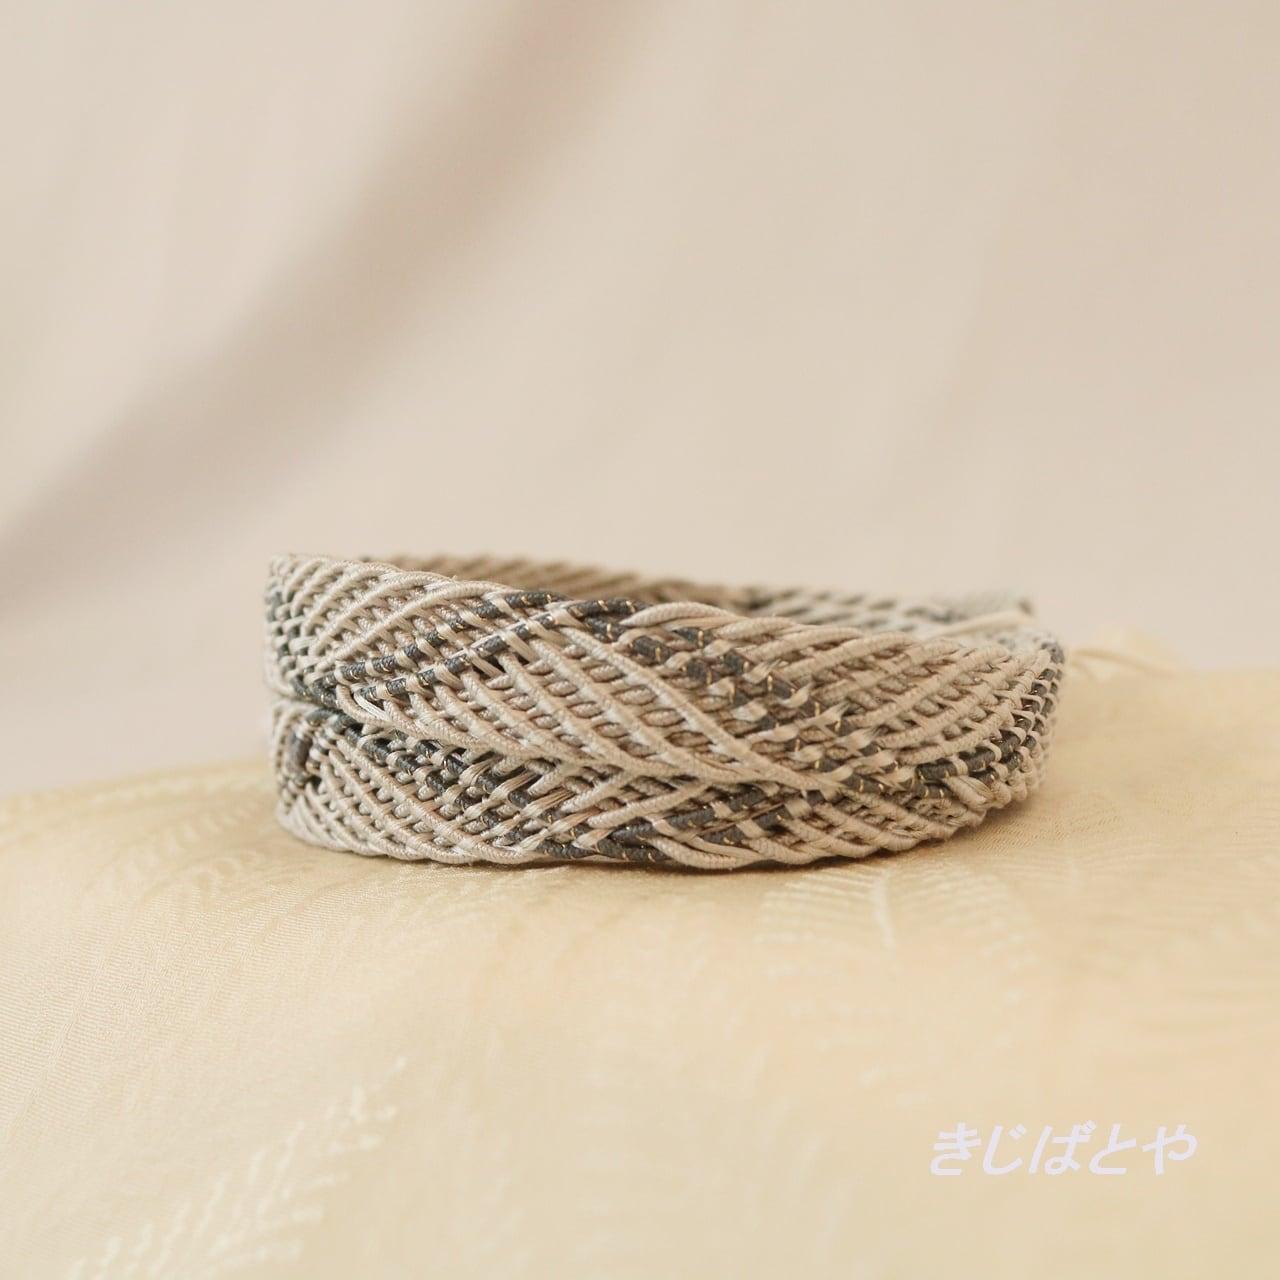 【T様ご予約品】正絹 錫紵(錫紵)の夏の帯締め